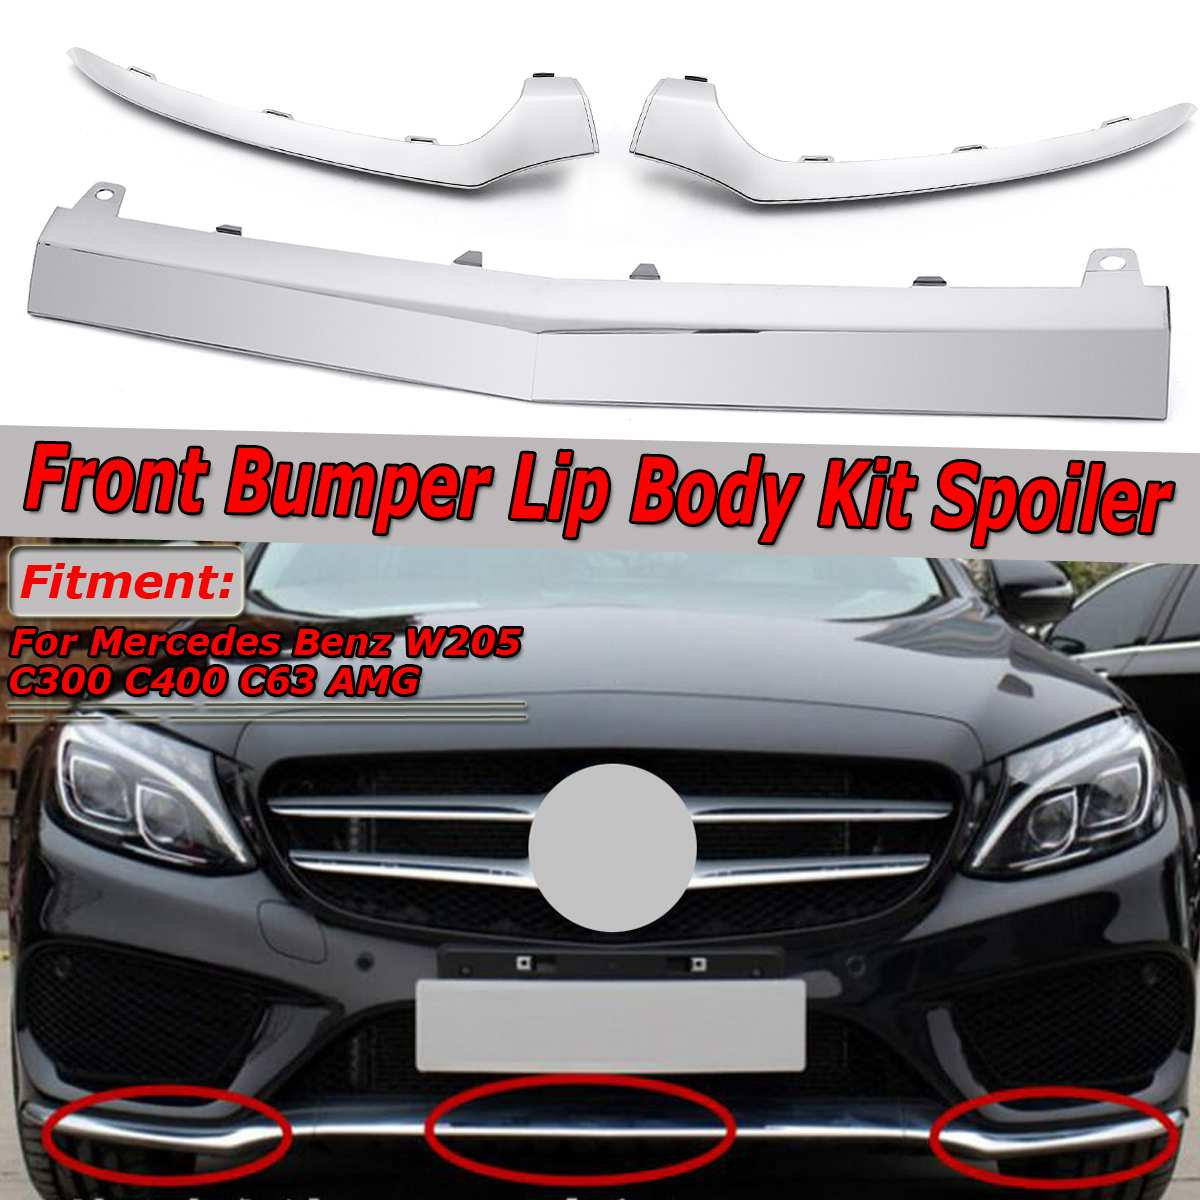 Chrome/รถสีดำด้านหน้ากันชนลิป Splitter Chrome สำหรับ Mercedes Benz W205 C300 C400 c63 สำหรับ AMG